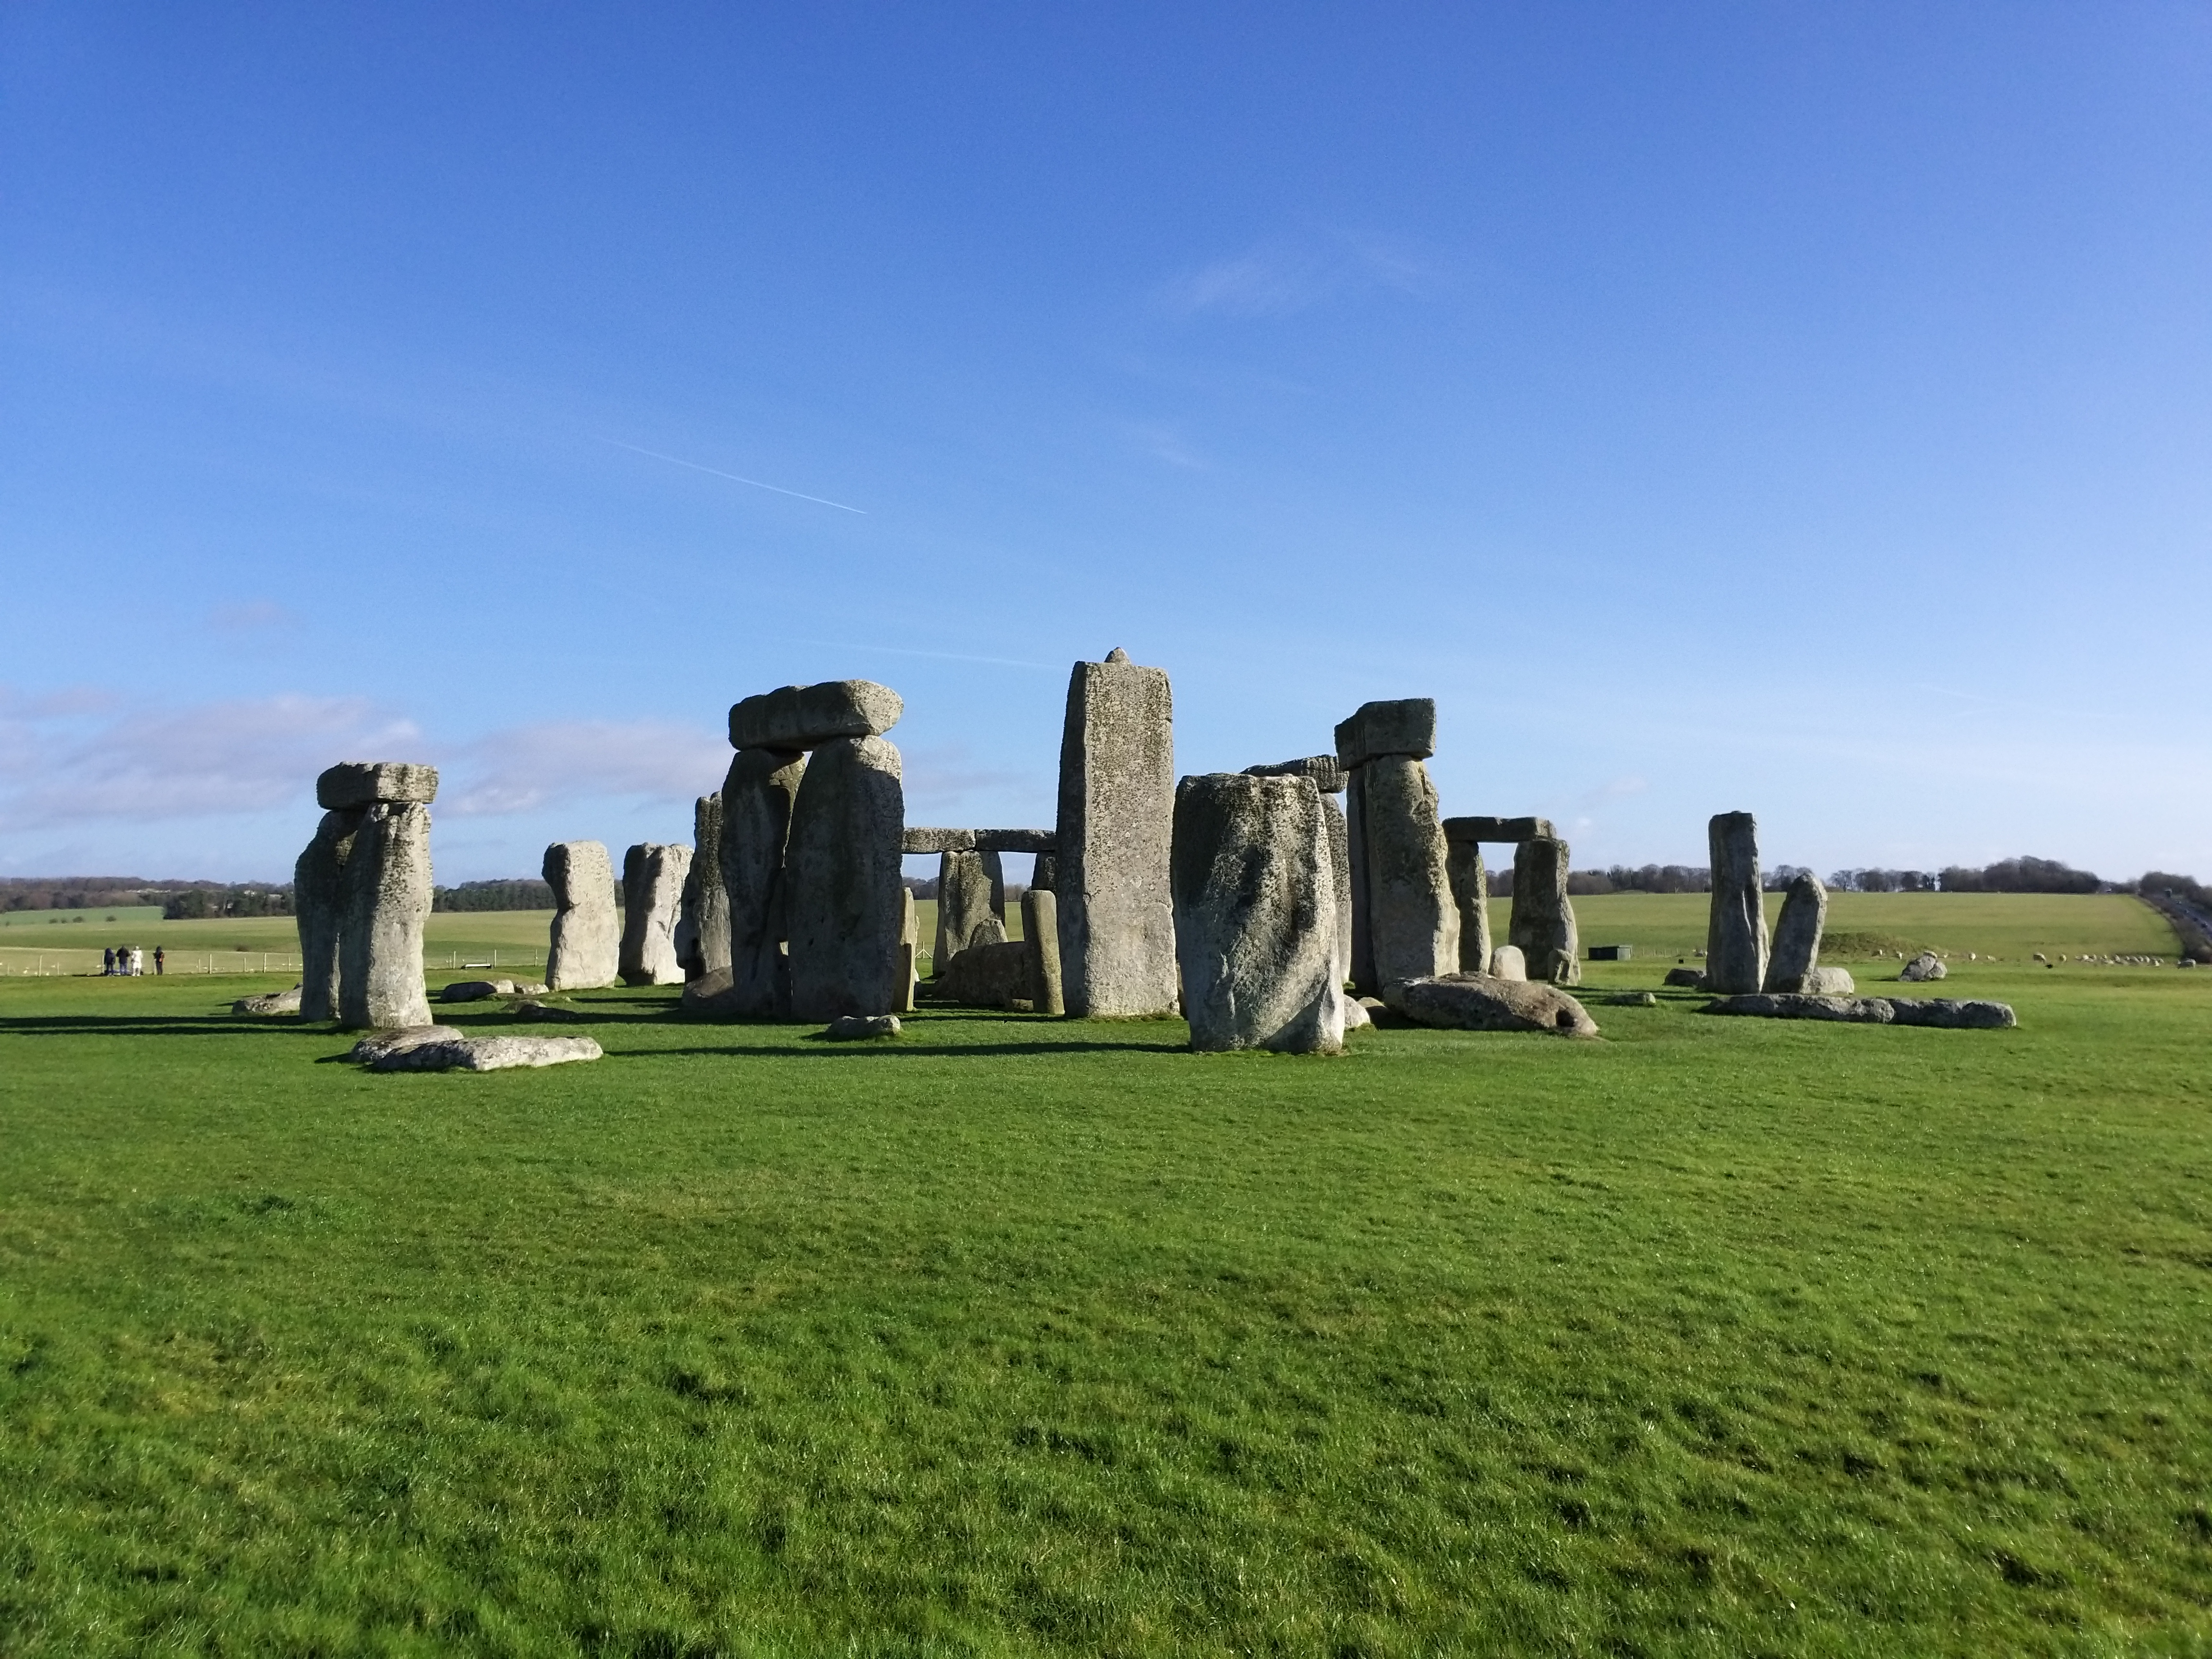 Tourism in UK. Photos-20200212_110707.jpg